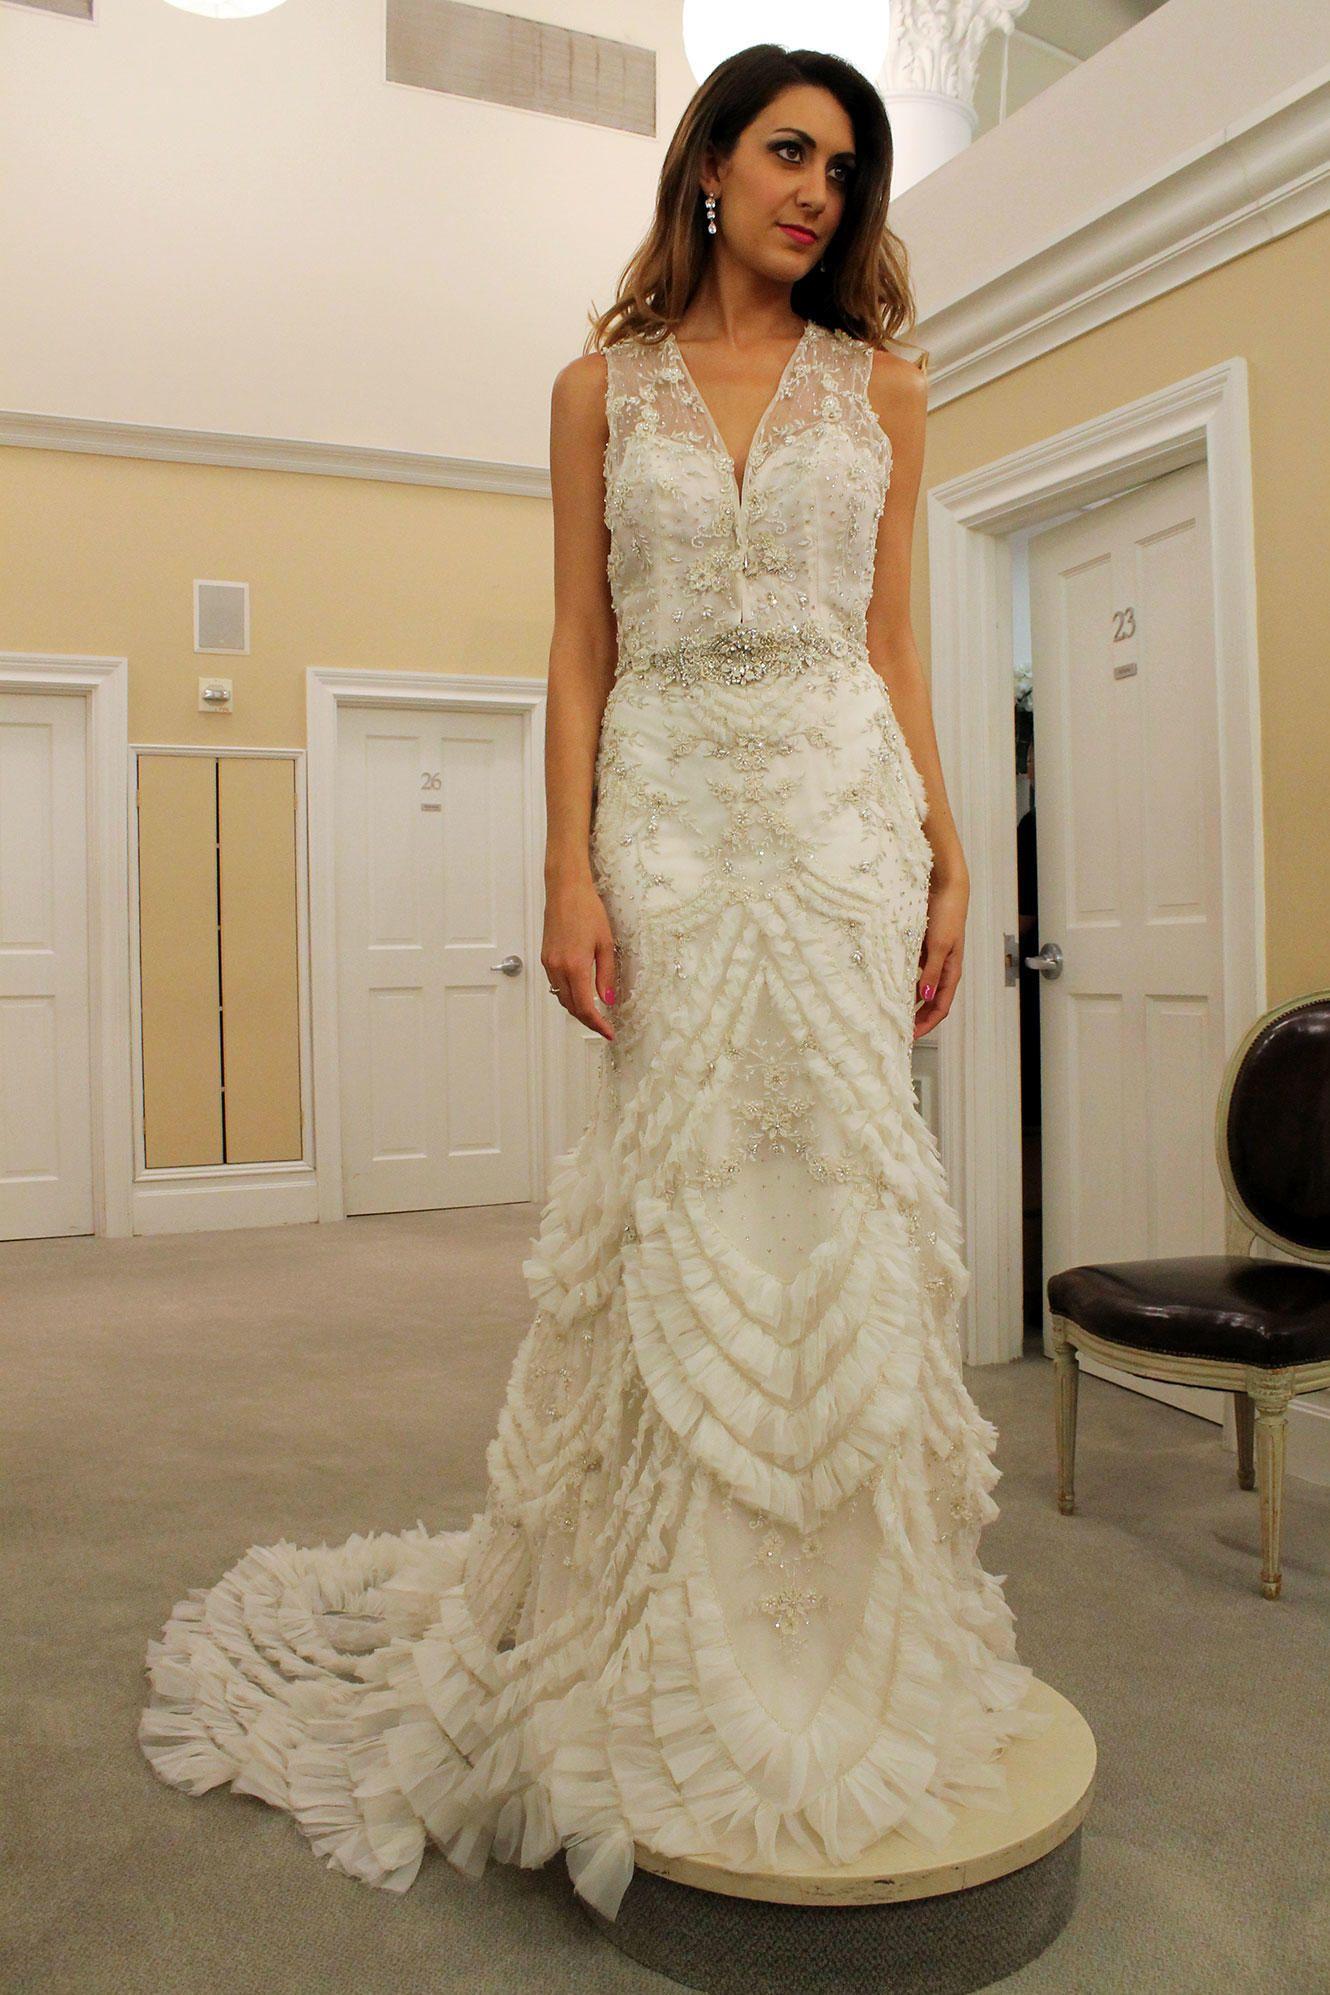 36b7a893e33 Season 14 Featured Dress  Rivini. Jumpsuit.  5